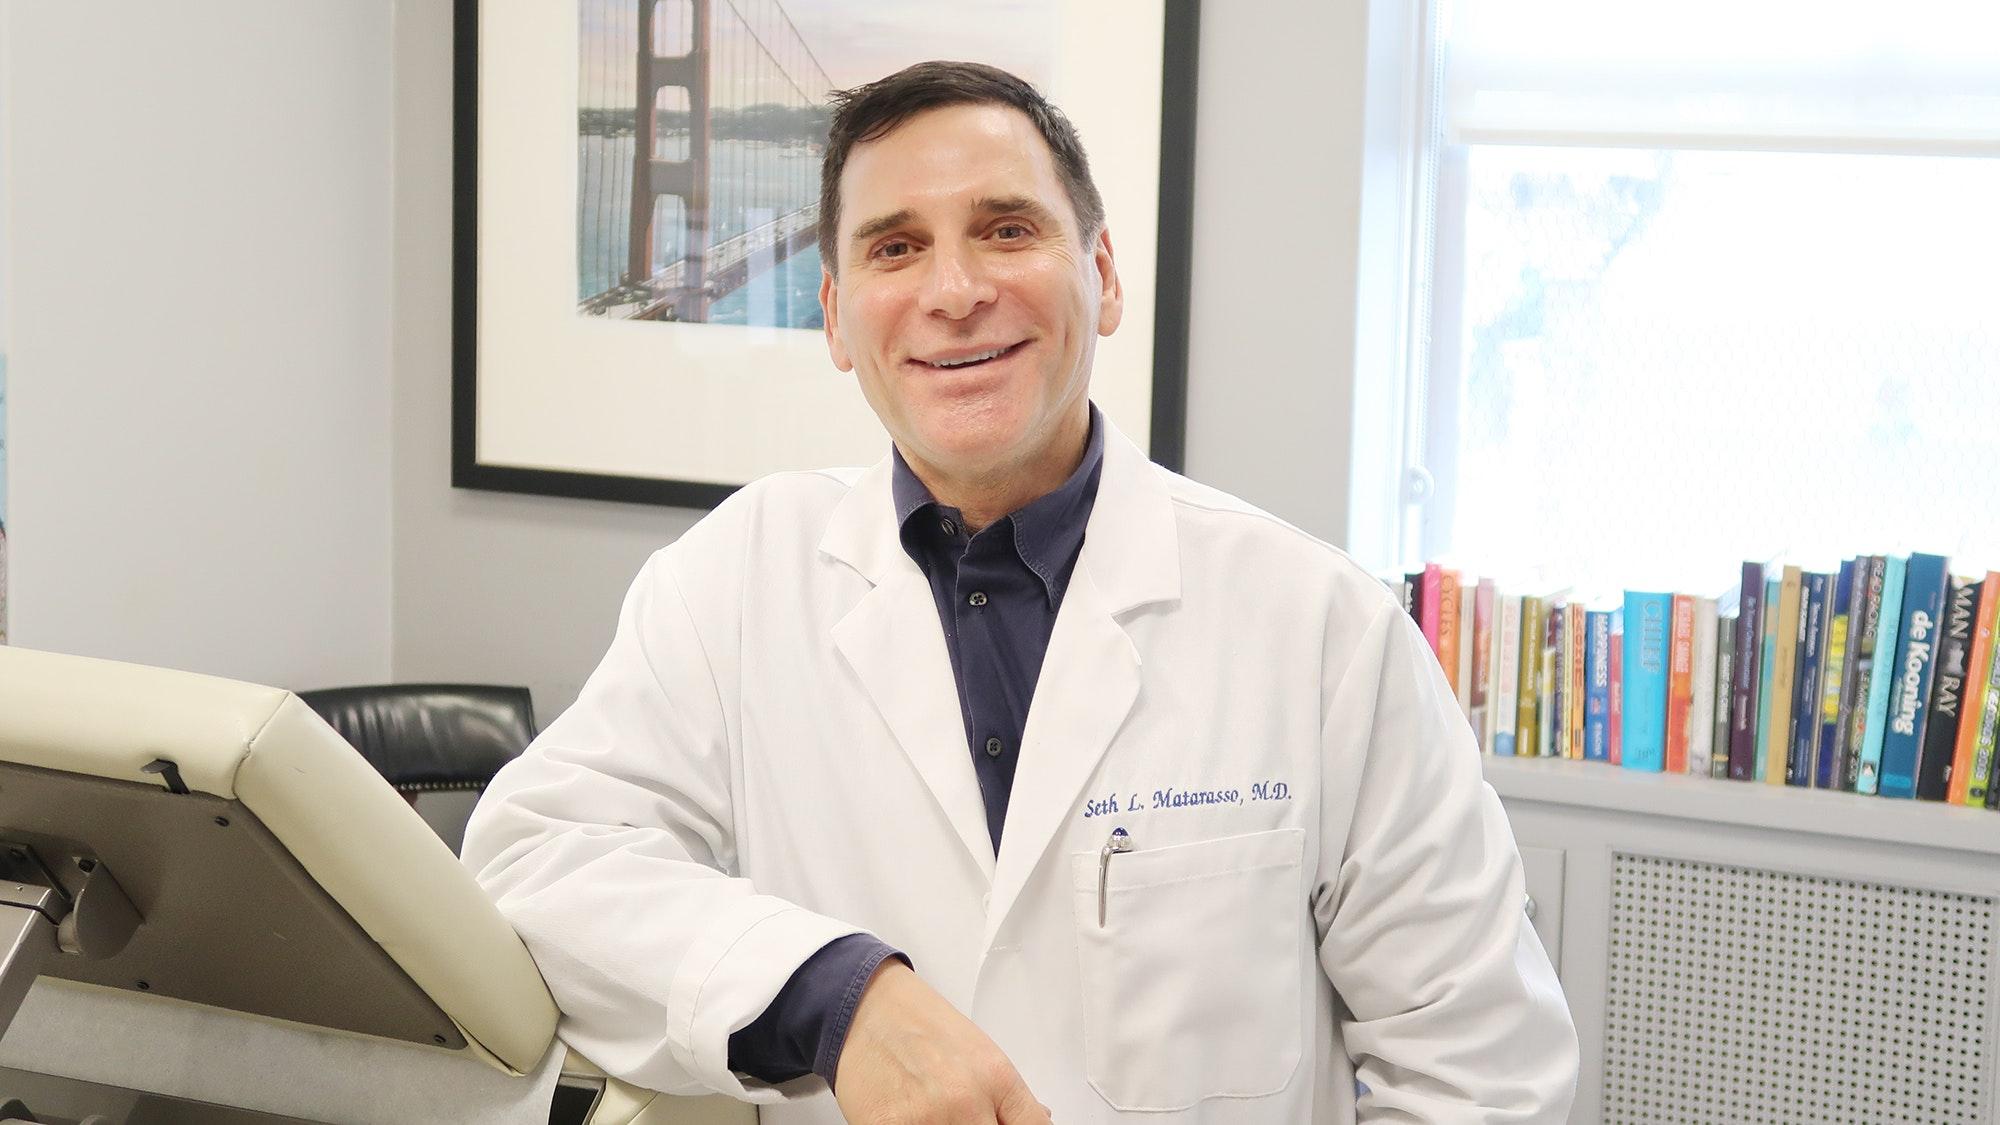 Dermatologist Dr. Seth Matarasso Shares His 3-Step Skincare Regimen and Personal Aesthetics Routine